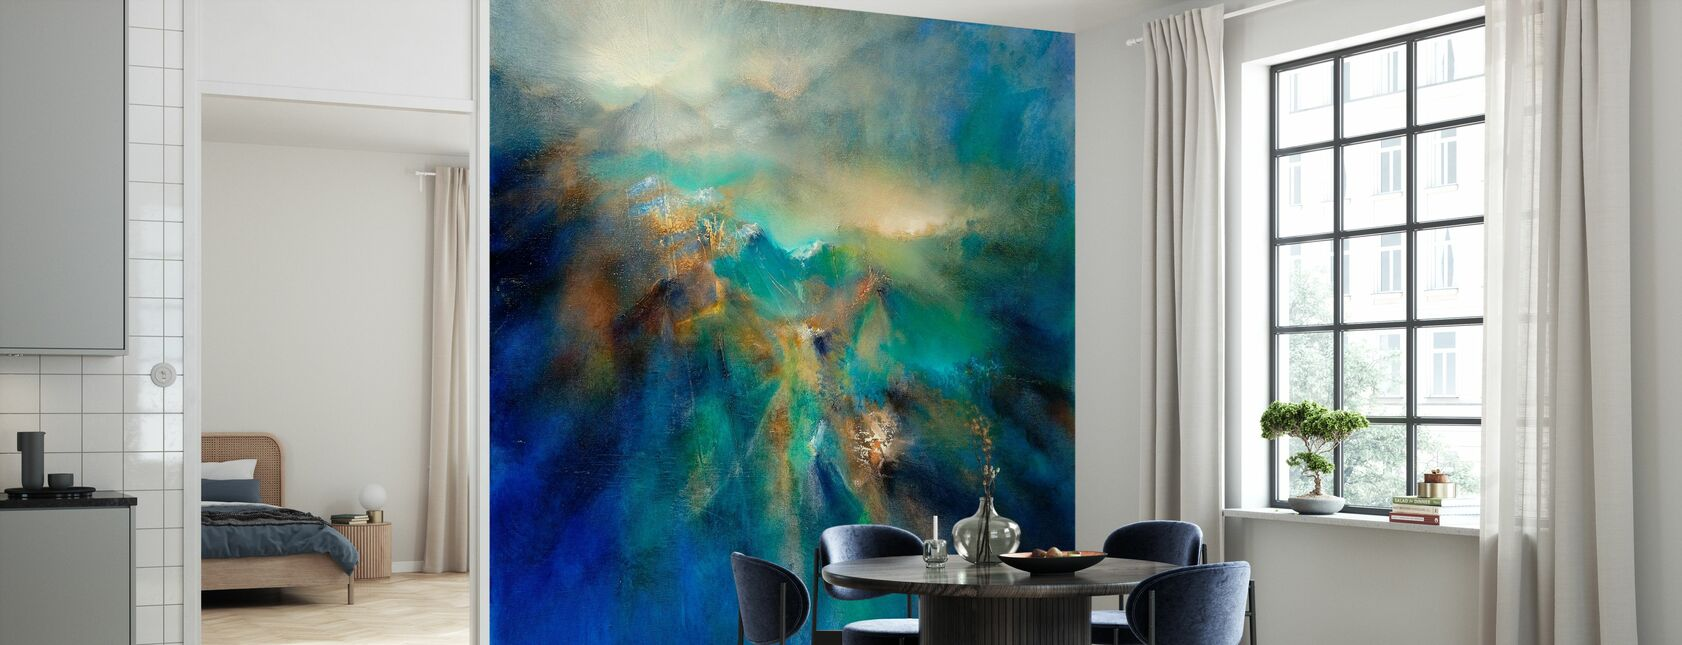 Above all Peaks - Wallpaper - Kitchen